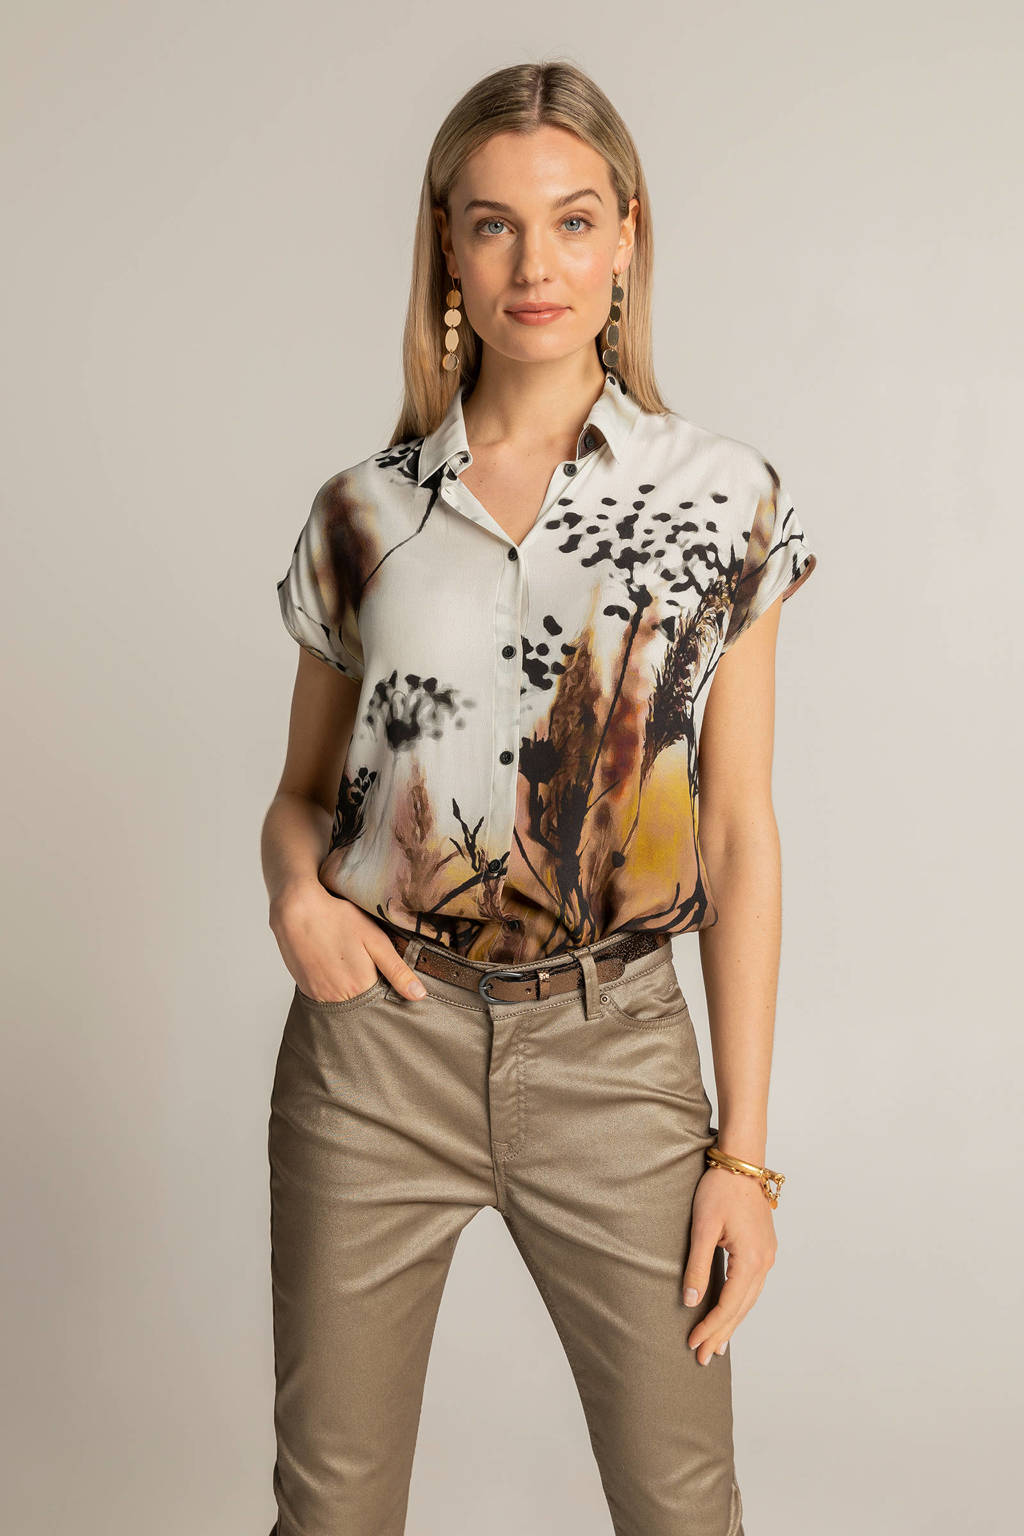 Expresso geweven blouse met printopdruk ecru/zwart/bruin, Ecru/zwart/bruin